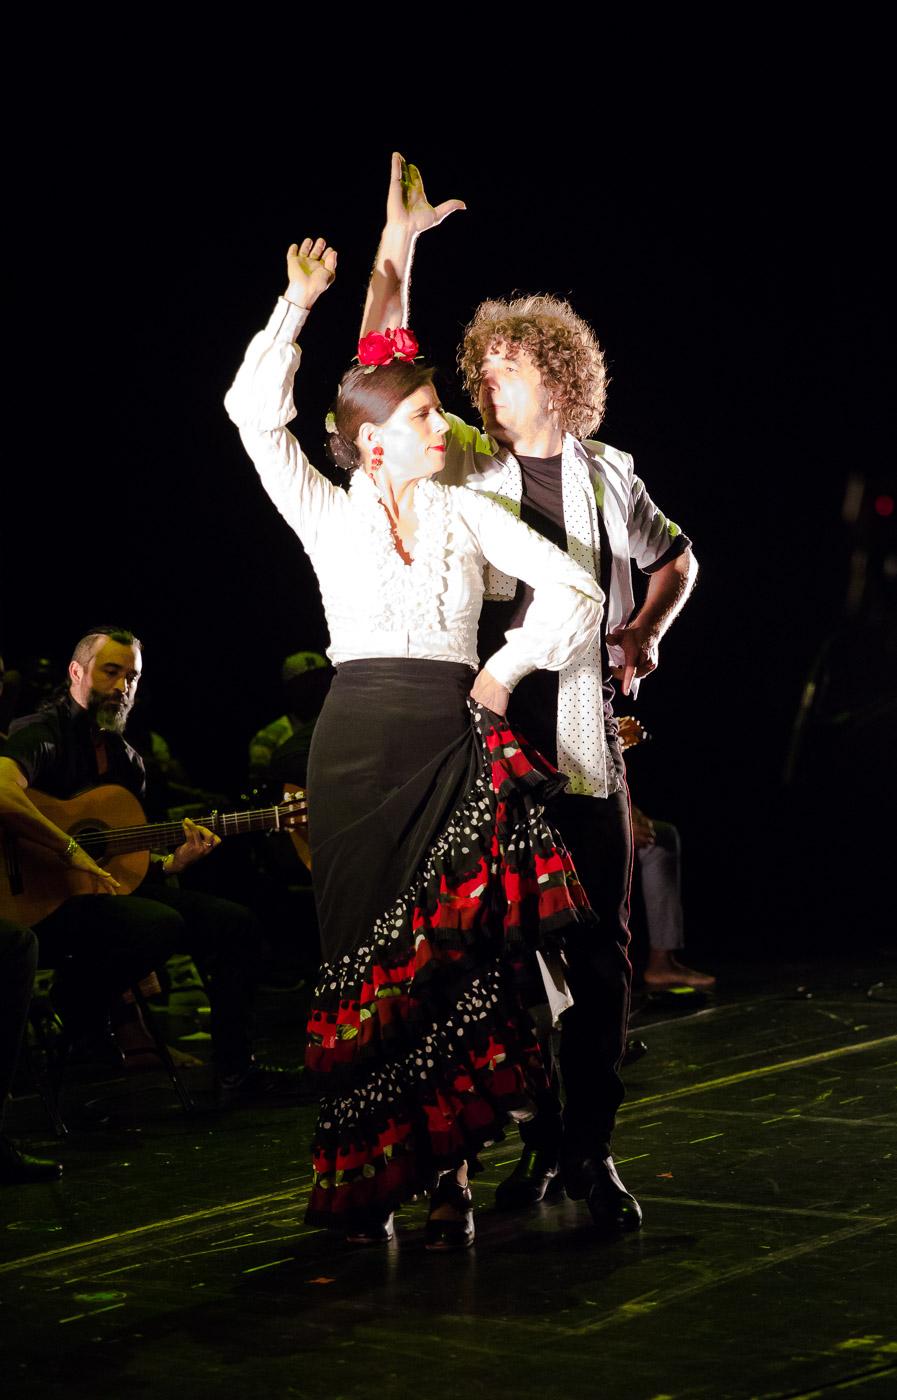 Laura La Risa y Compañía aus Spanien. Foto: Jennifer Kauka